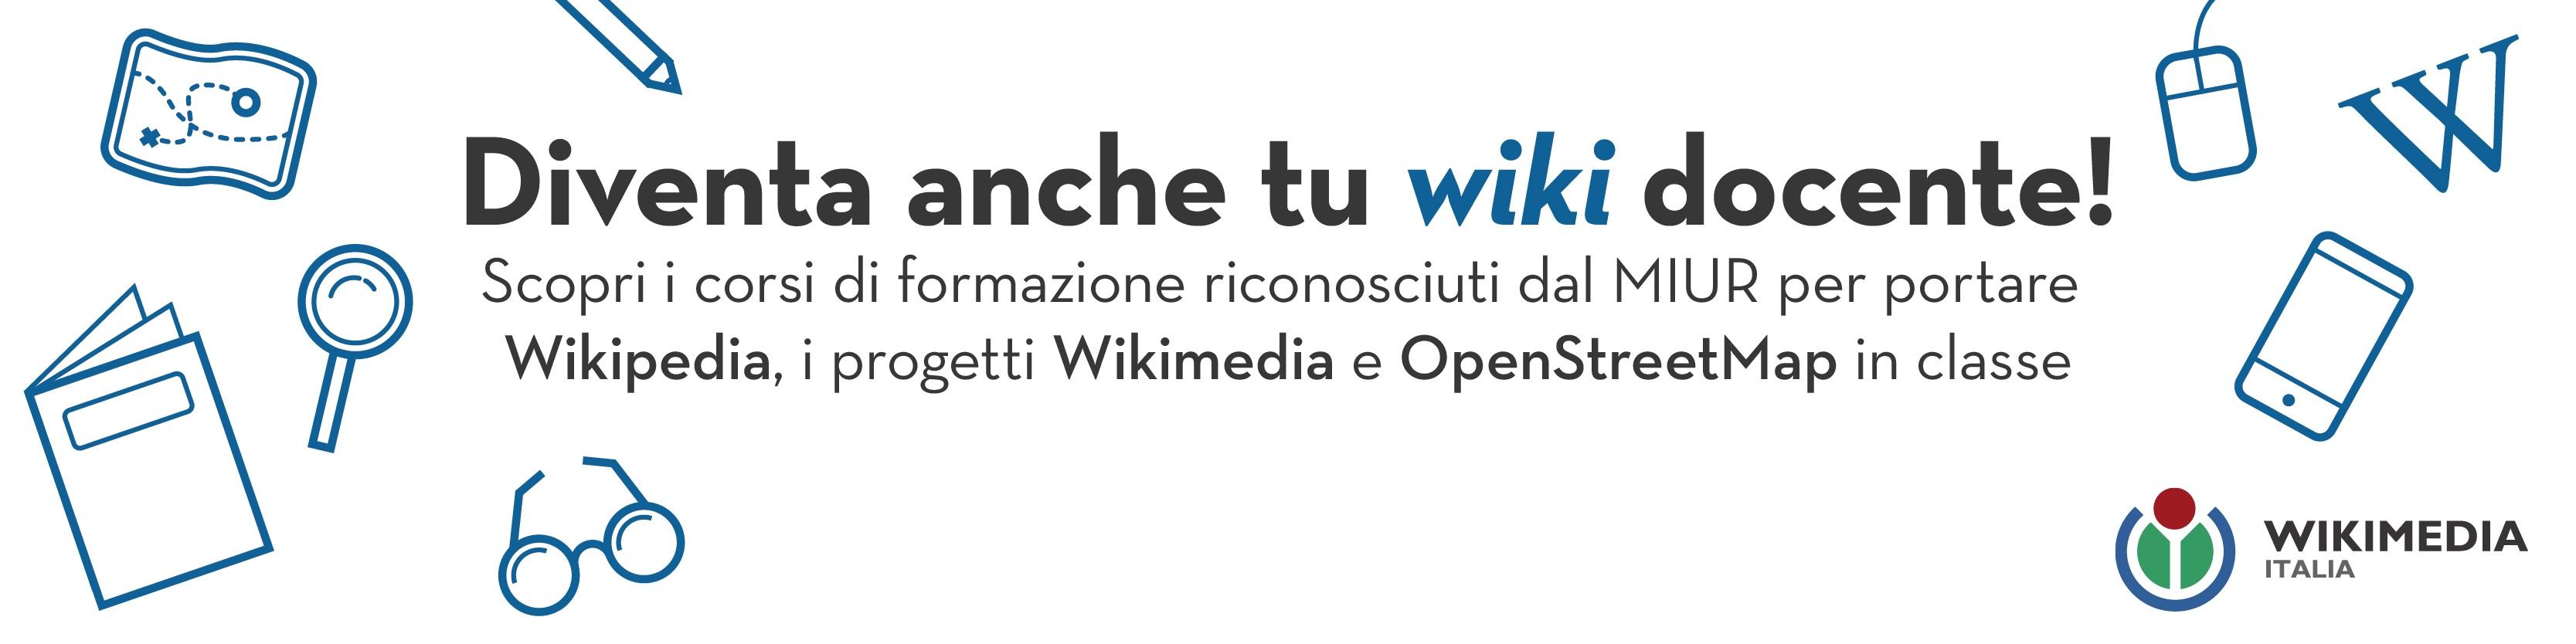 minisito_1600x400_wikidocente_2019 - UPDATE2020